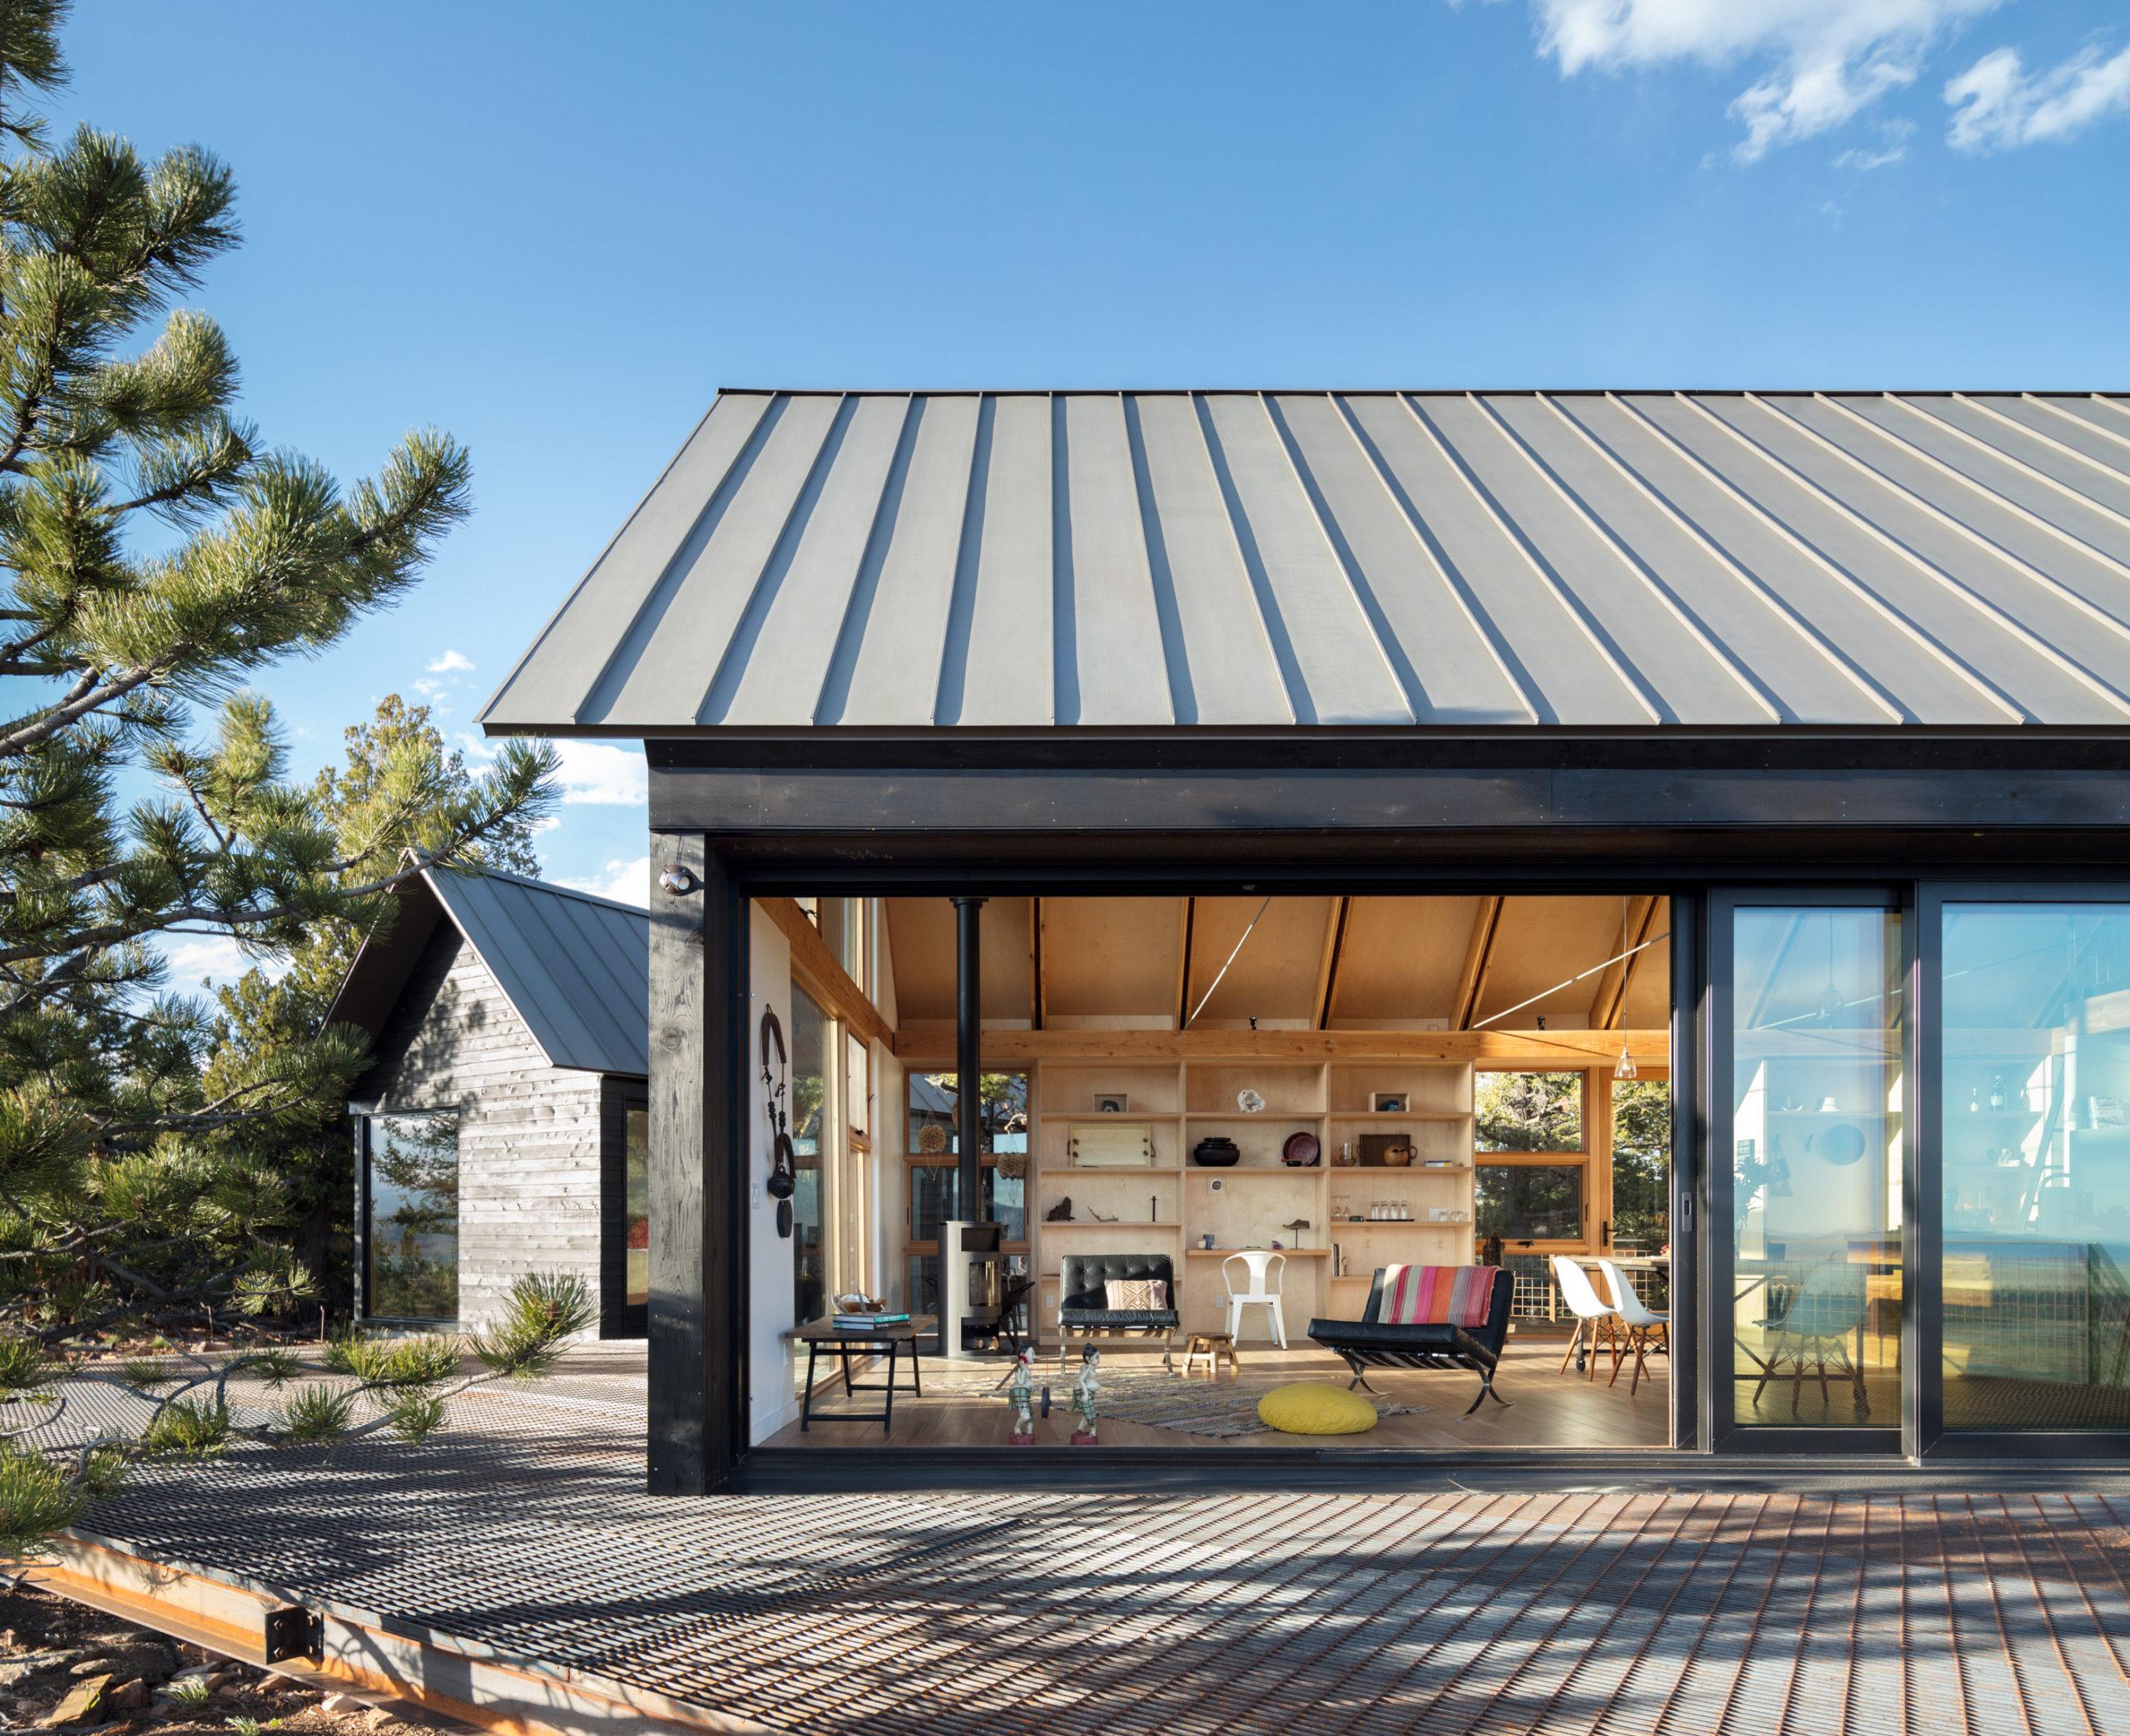 Exterior view of Big Cabin | Little Cabin by Renée del Gaudio Architecture.